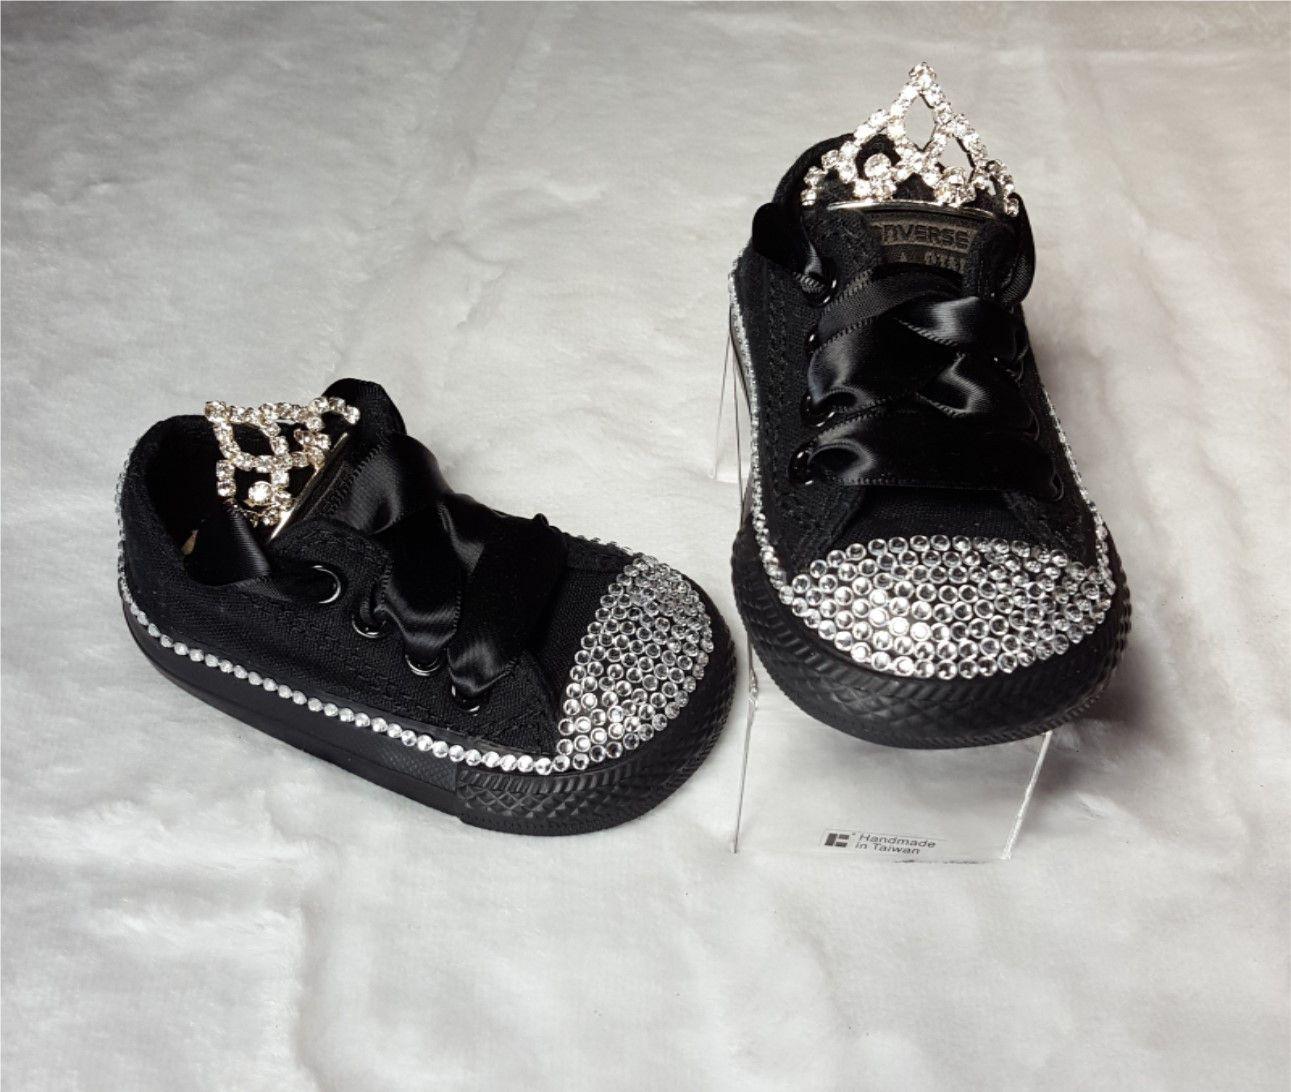 9dddde2c073da6 Black Tiara Bling Converse - Tiara tounge detail - Satin laces - Rhinestone  toe